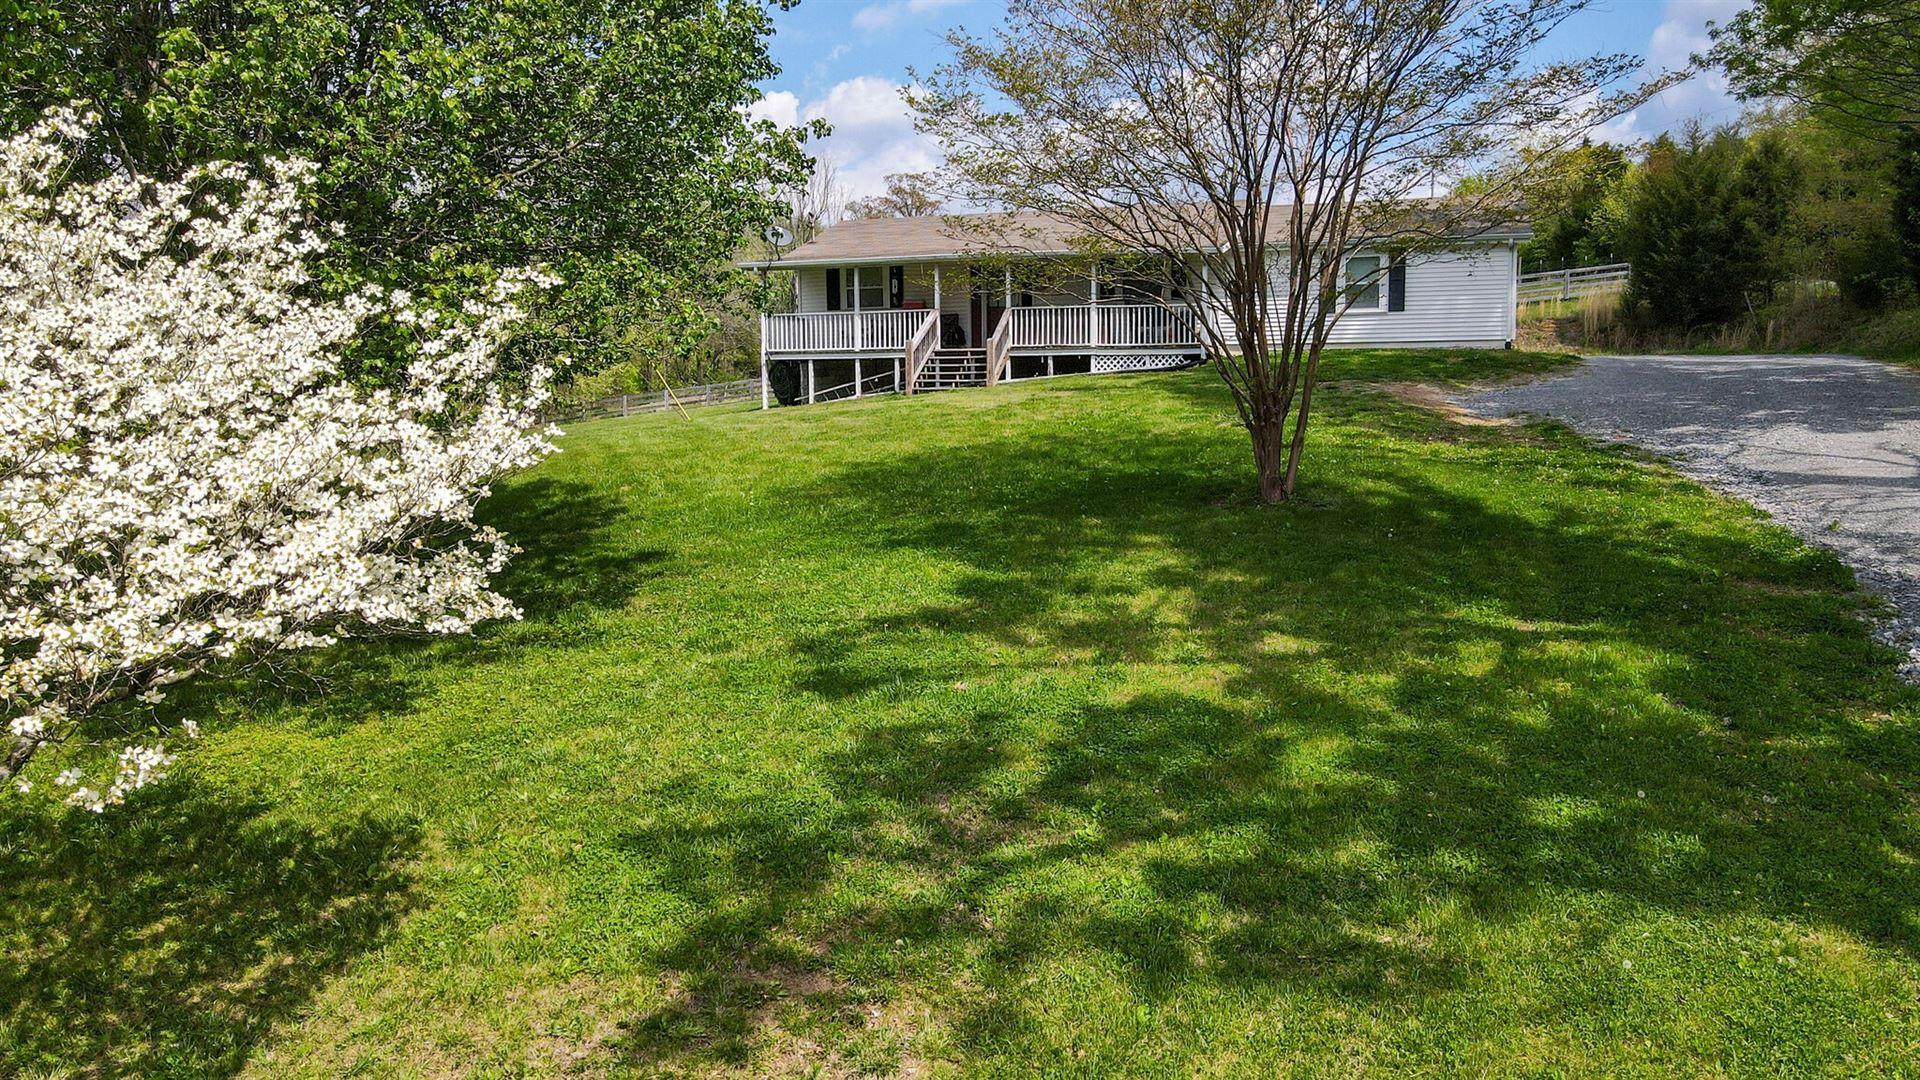 1754 Long Hollow Pike, Gallatin, TN 37066 - MLS#: 2272361